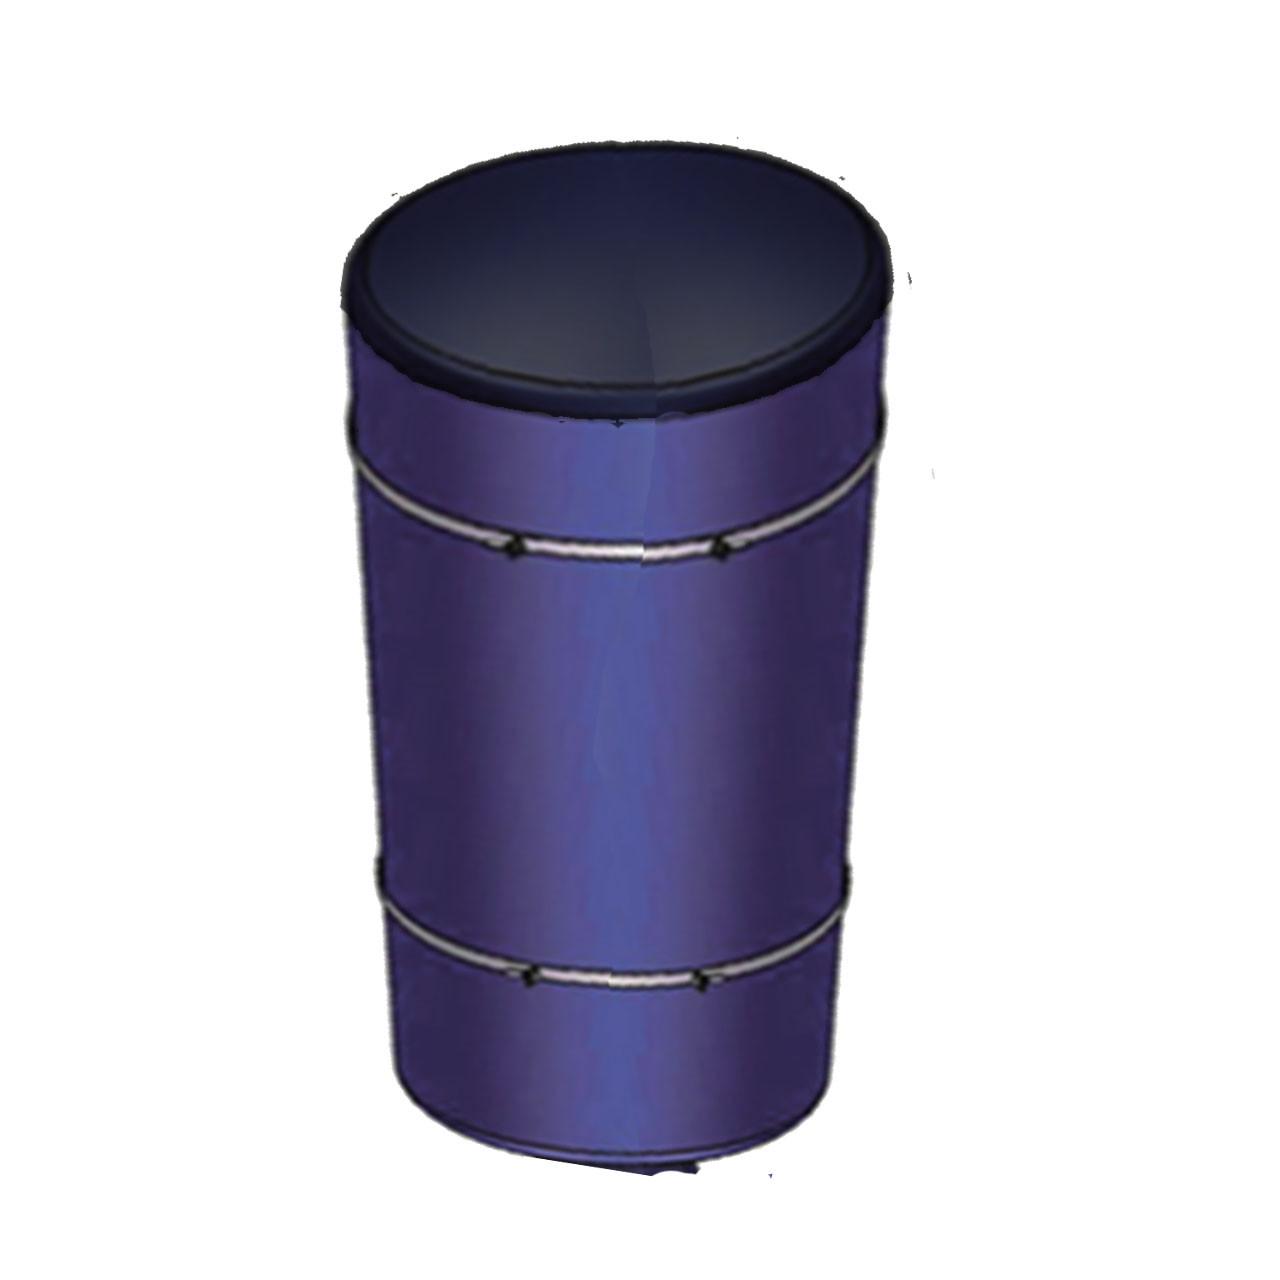 Tambor de 200 litros para alimentador solar automatico ProAqua de 150 kilos